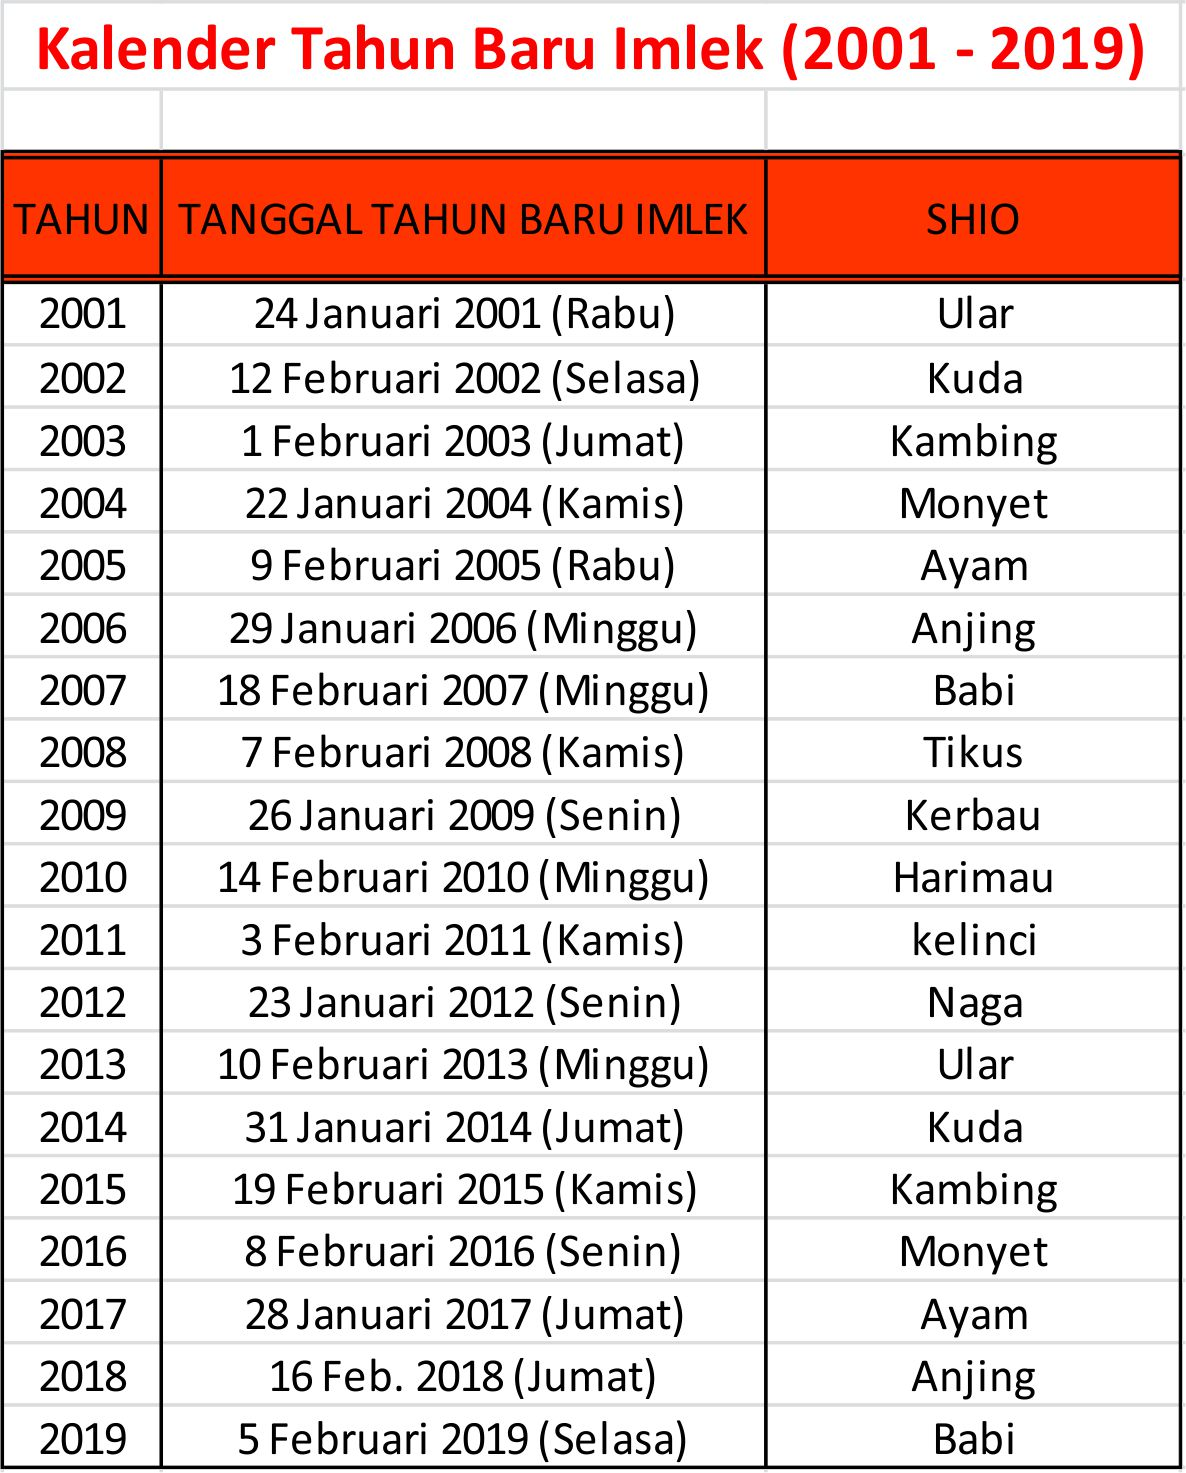 Kalender Tahun Baru Imlek (2001 - 2019)